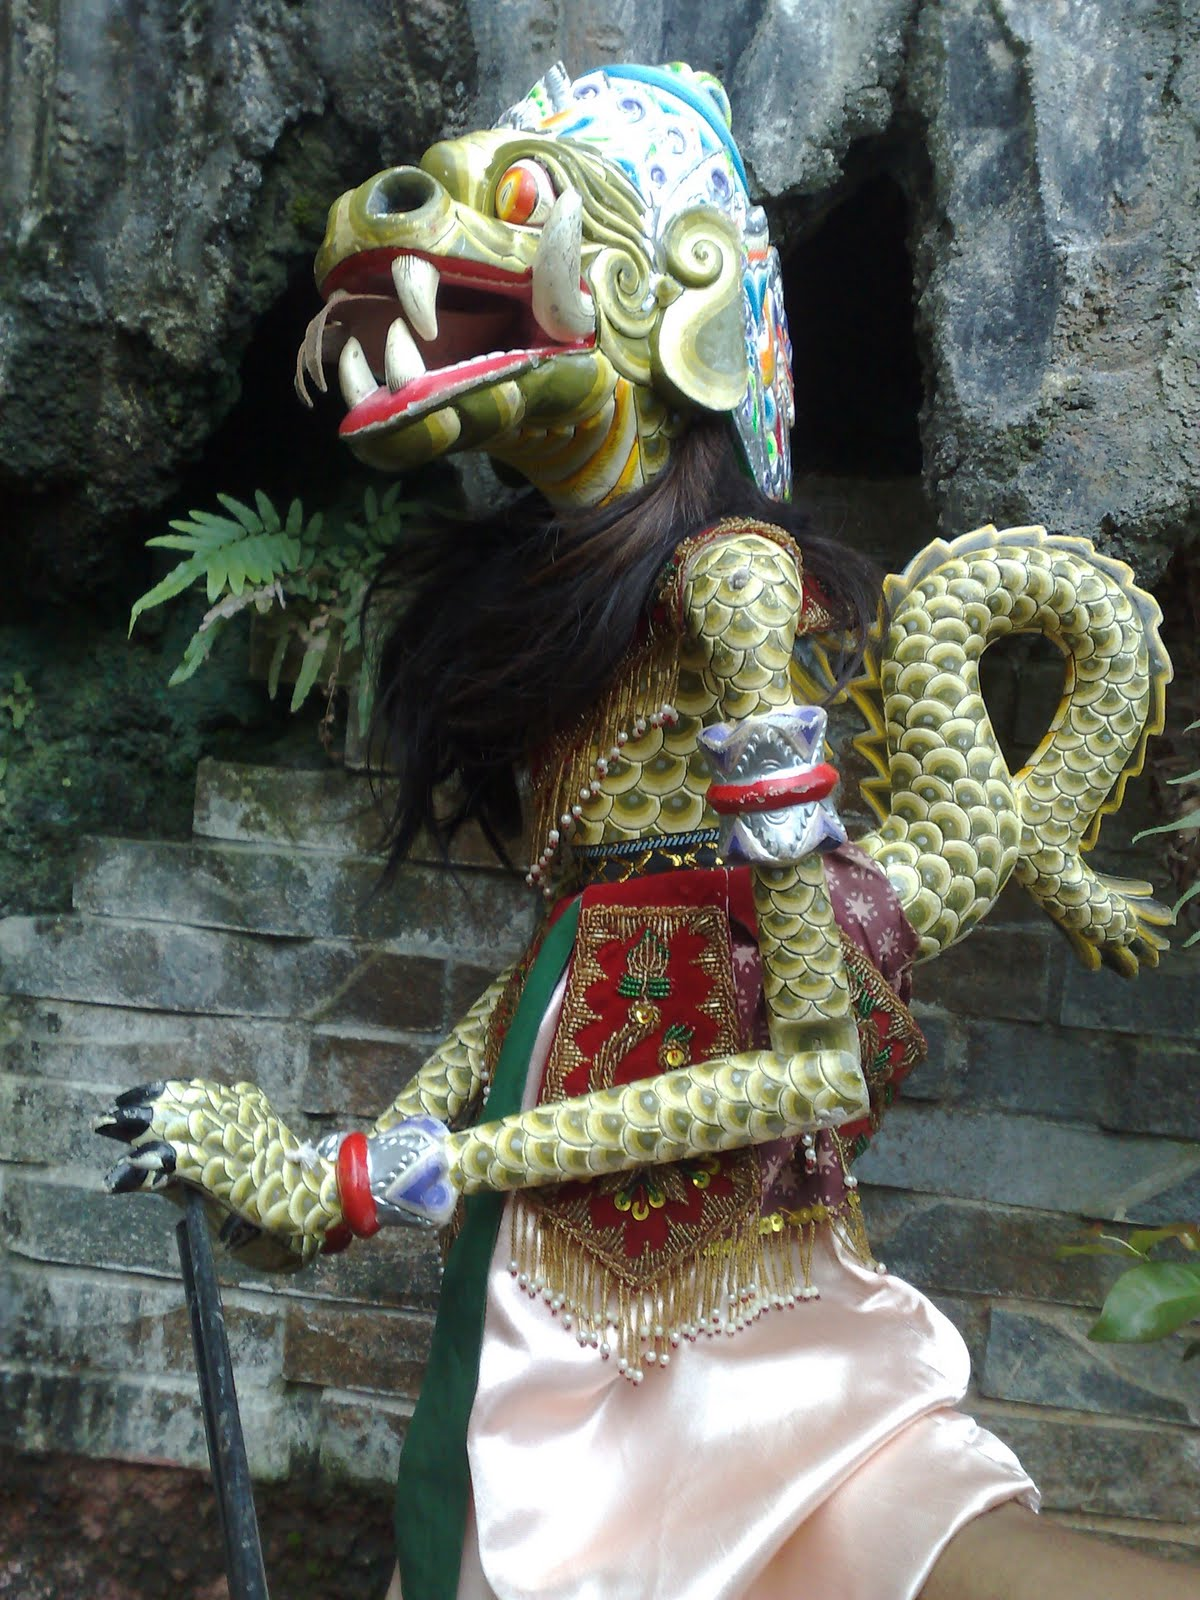 Poto Wayang Golek Hanoman